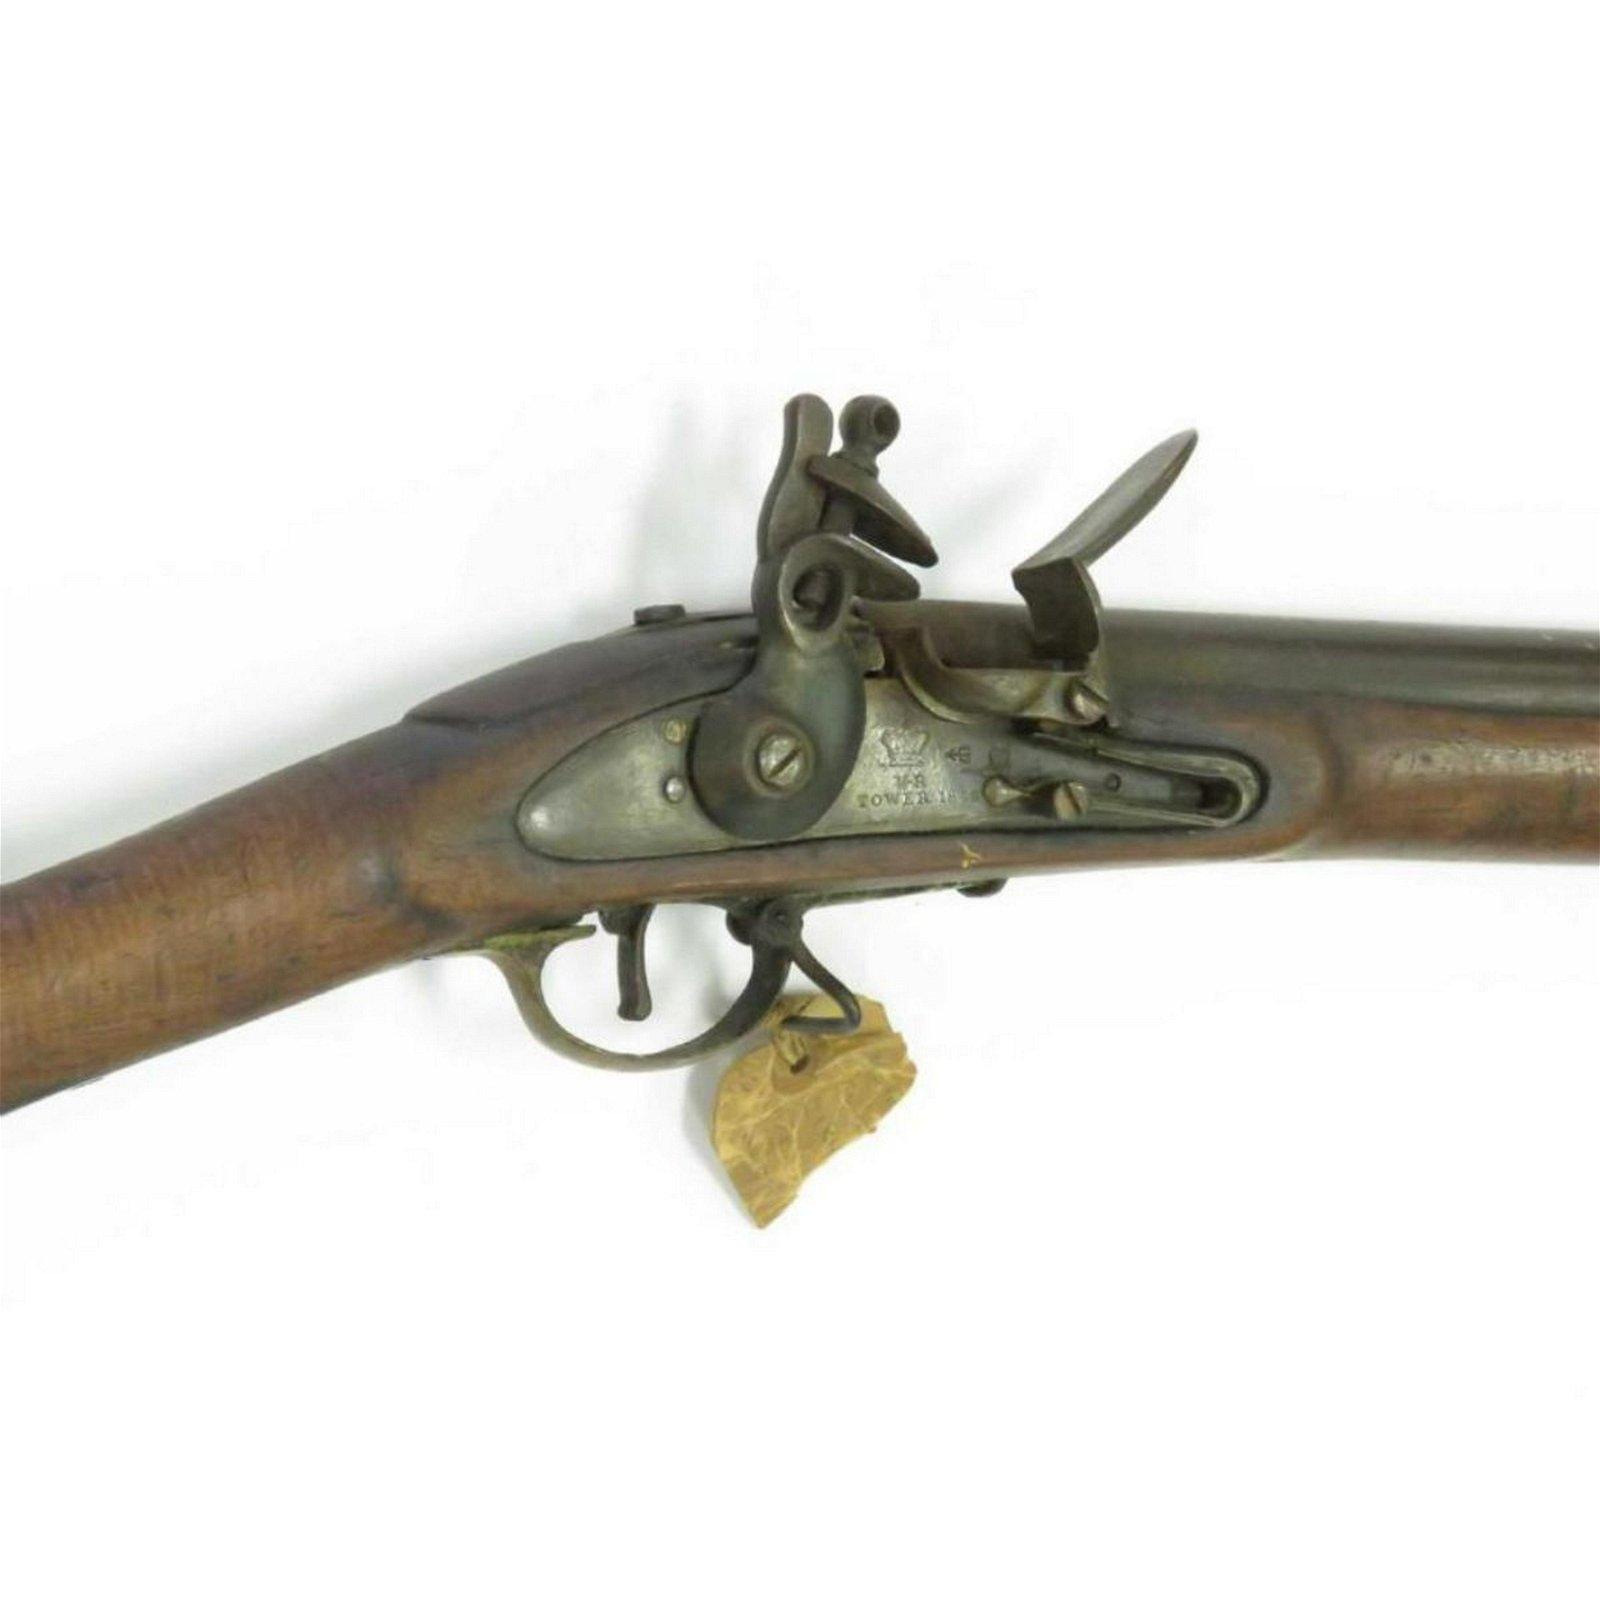 English Tower Pattern 1846 .75 Cal Flintlock Musket